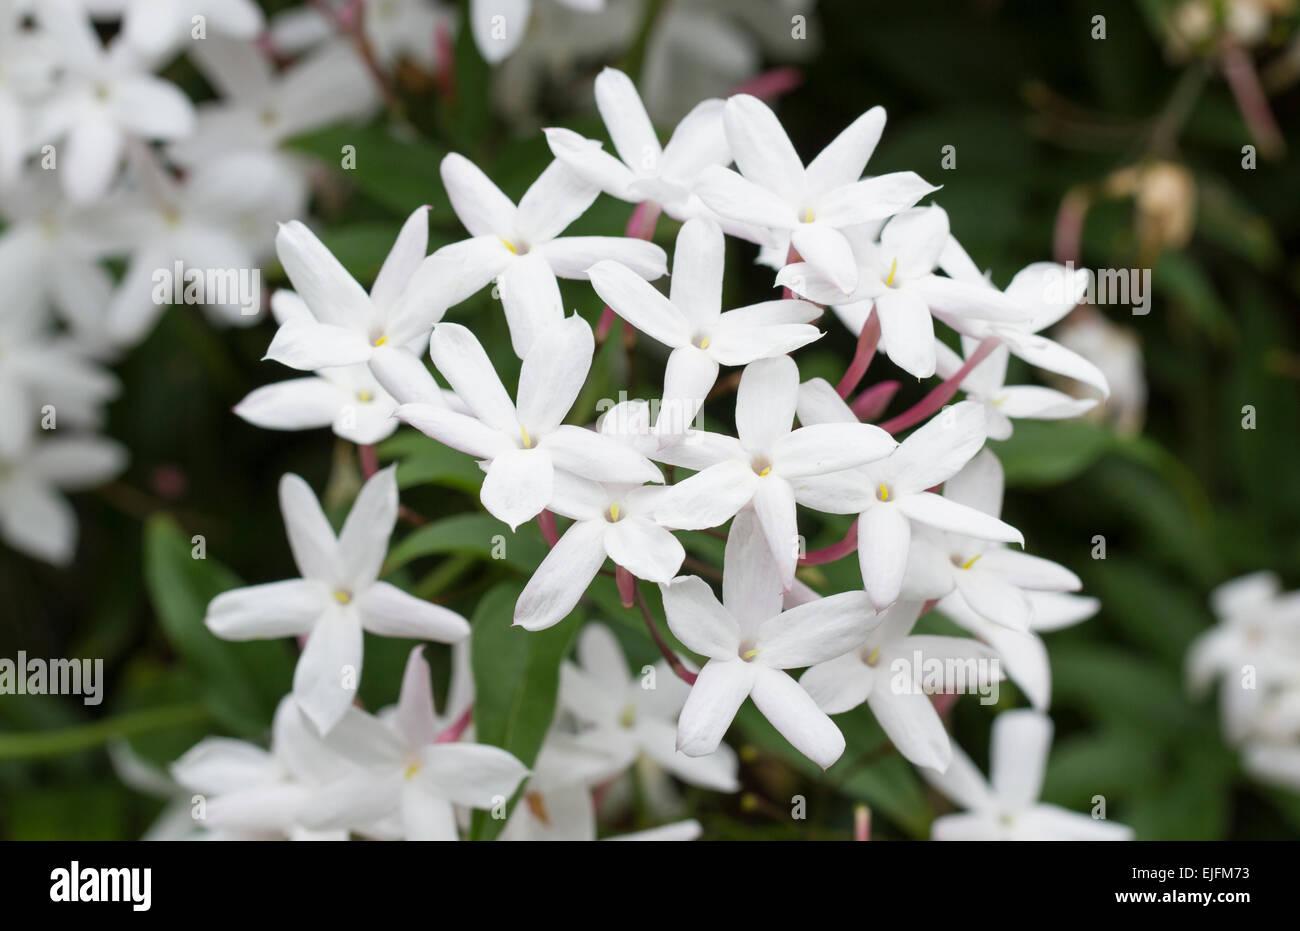 Lovely Star Jasmine blooming in spring - Stock Image